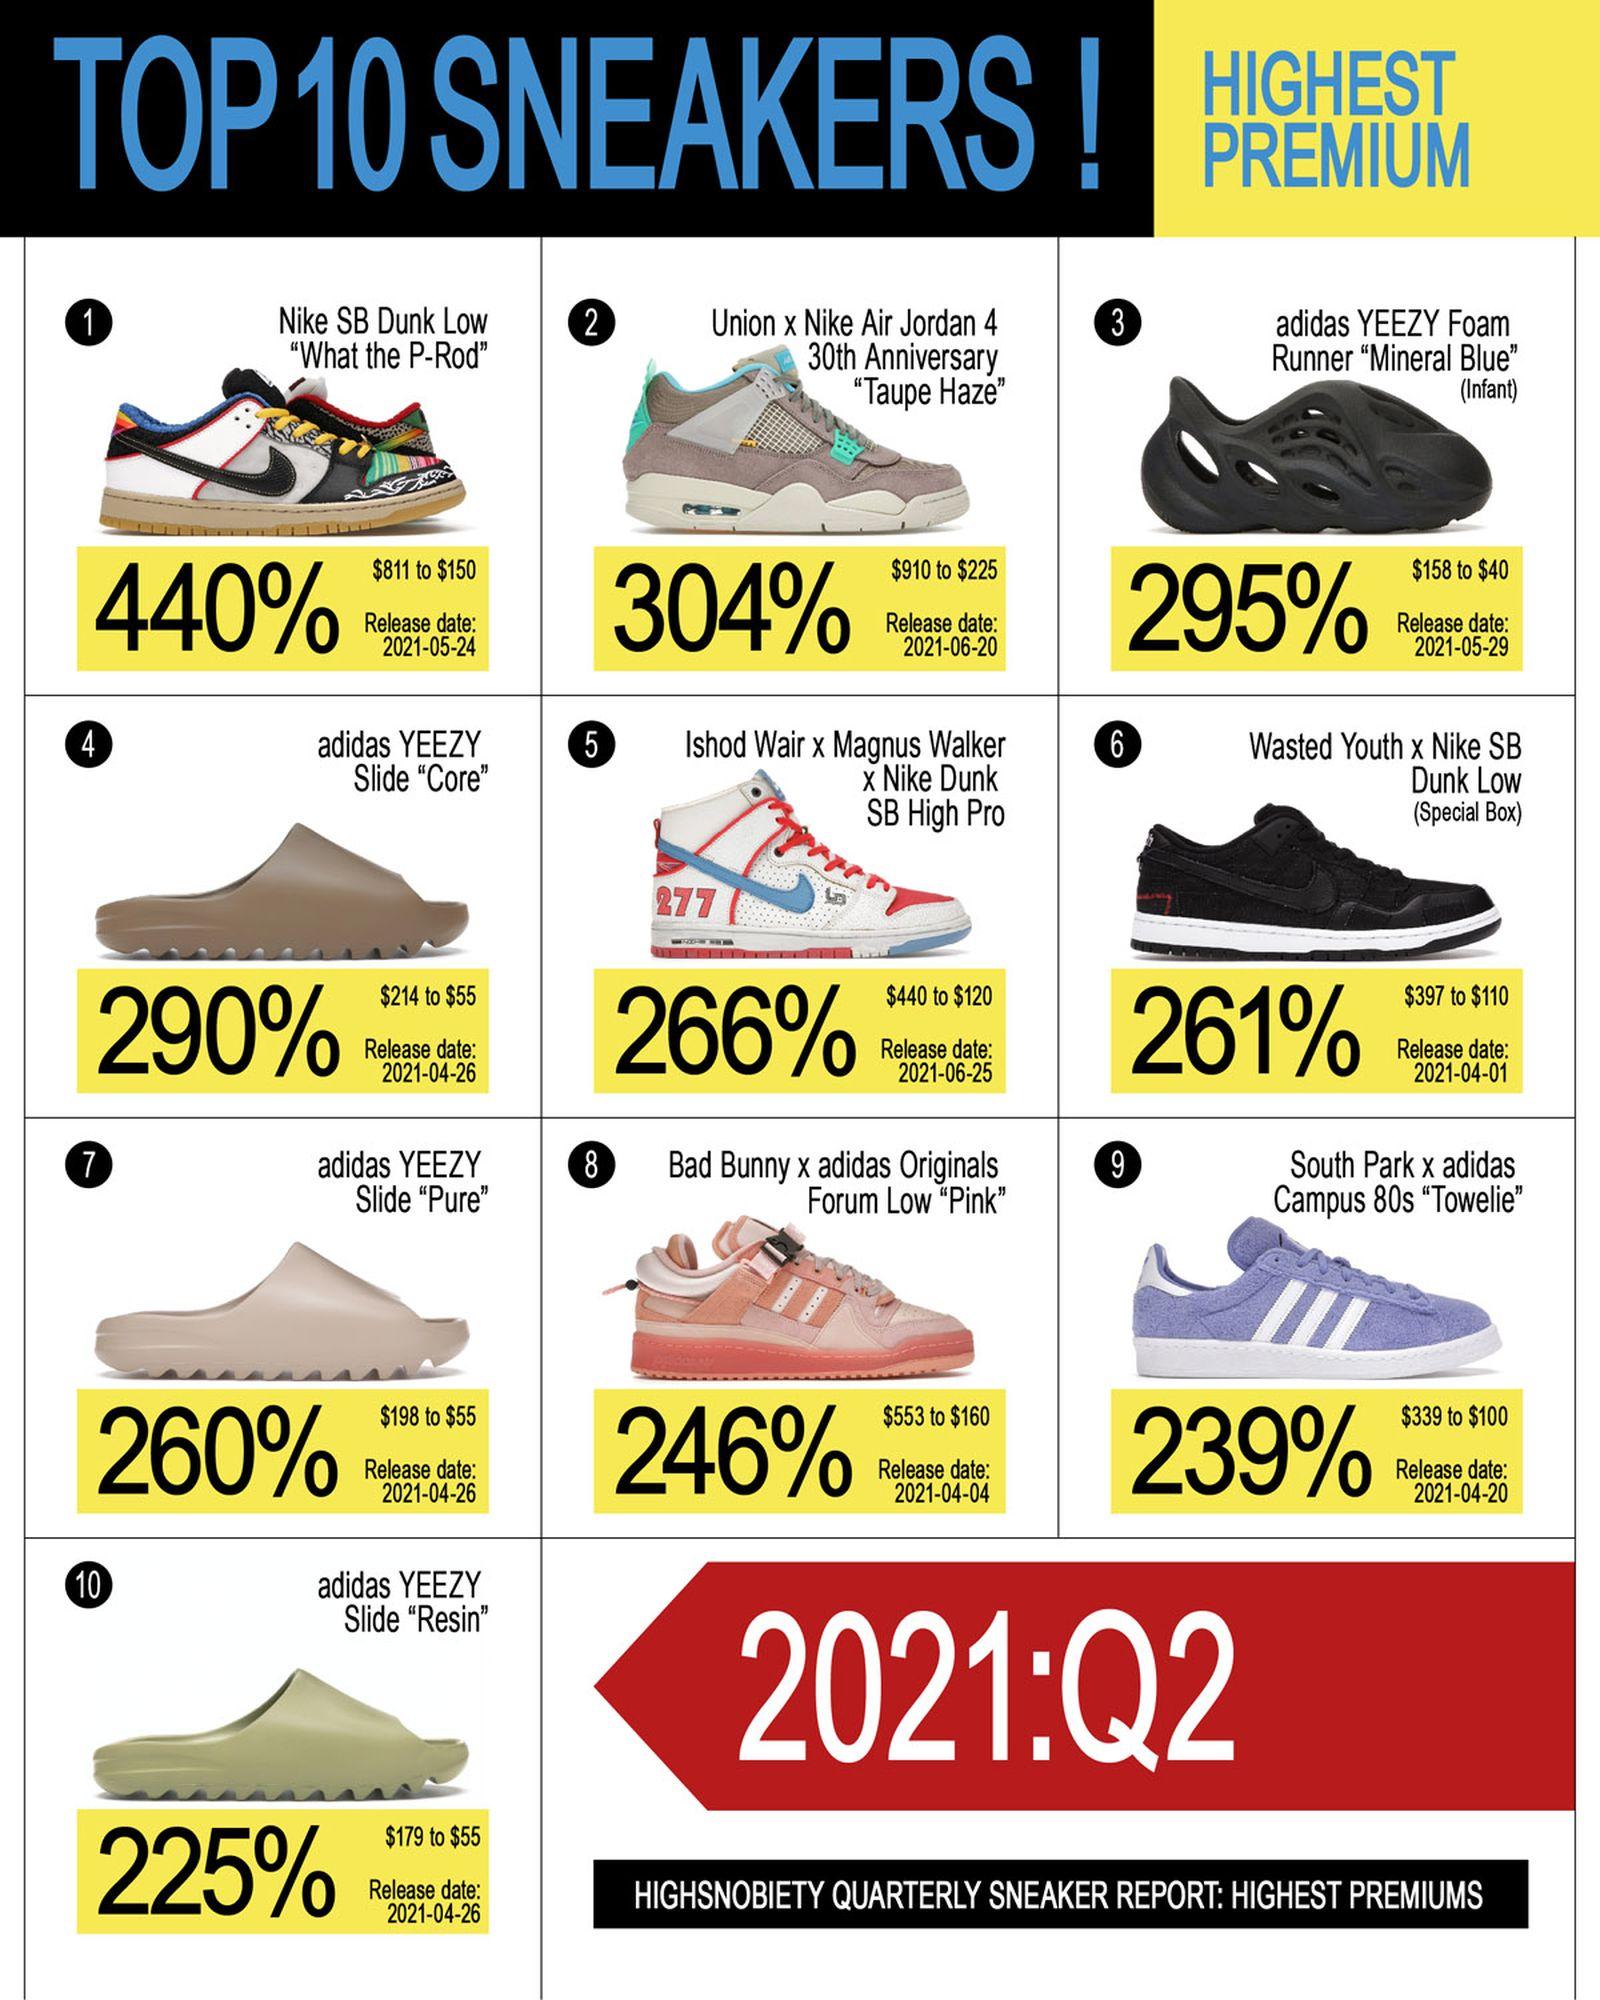 ED_SM_2021_Q2_Sneaker_Report_01